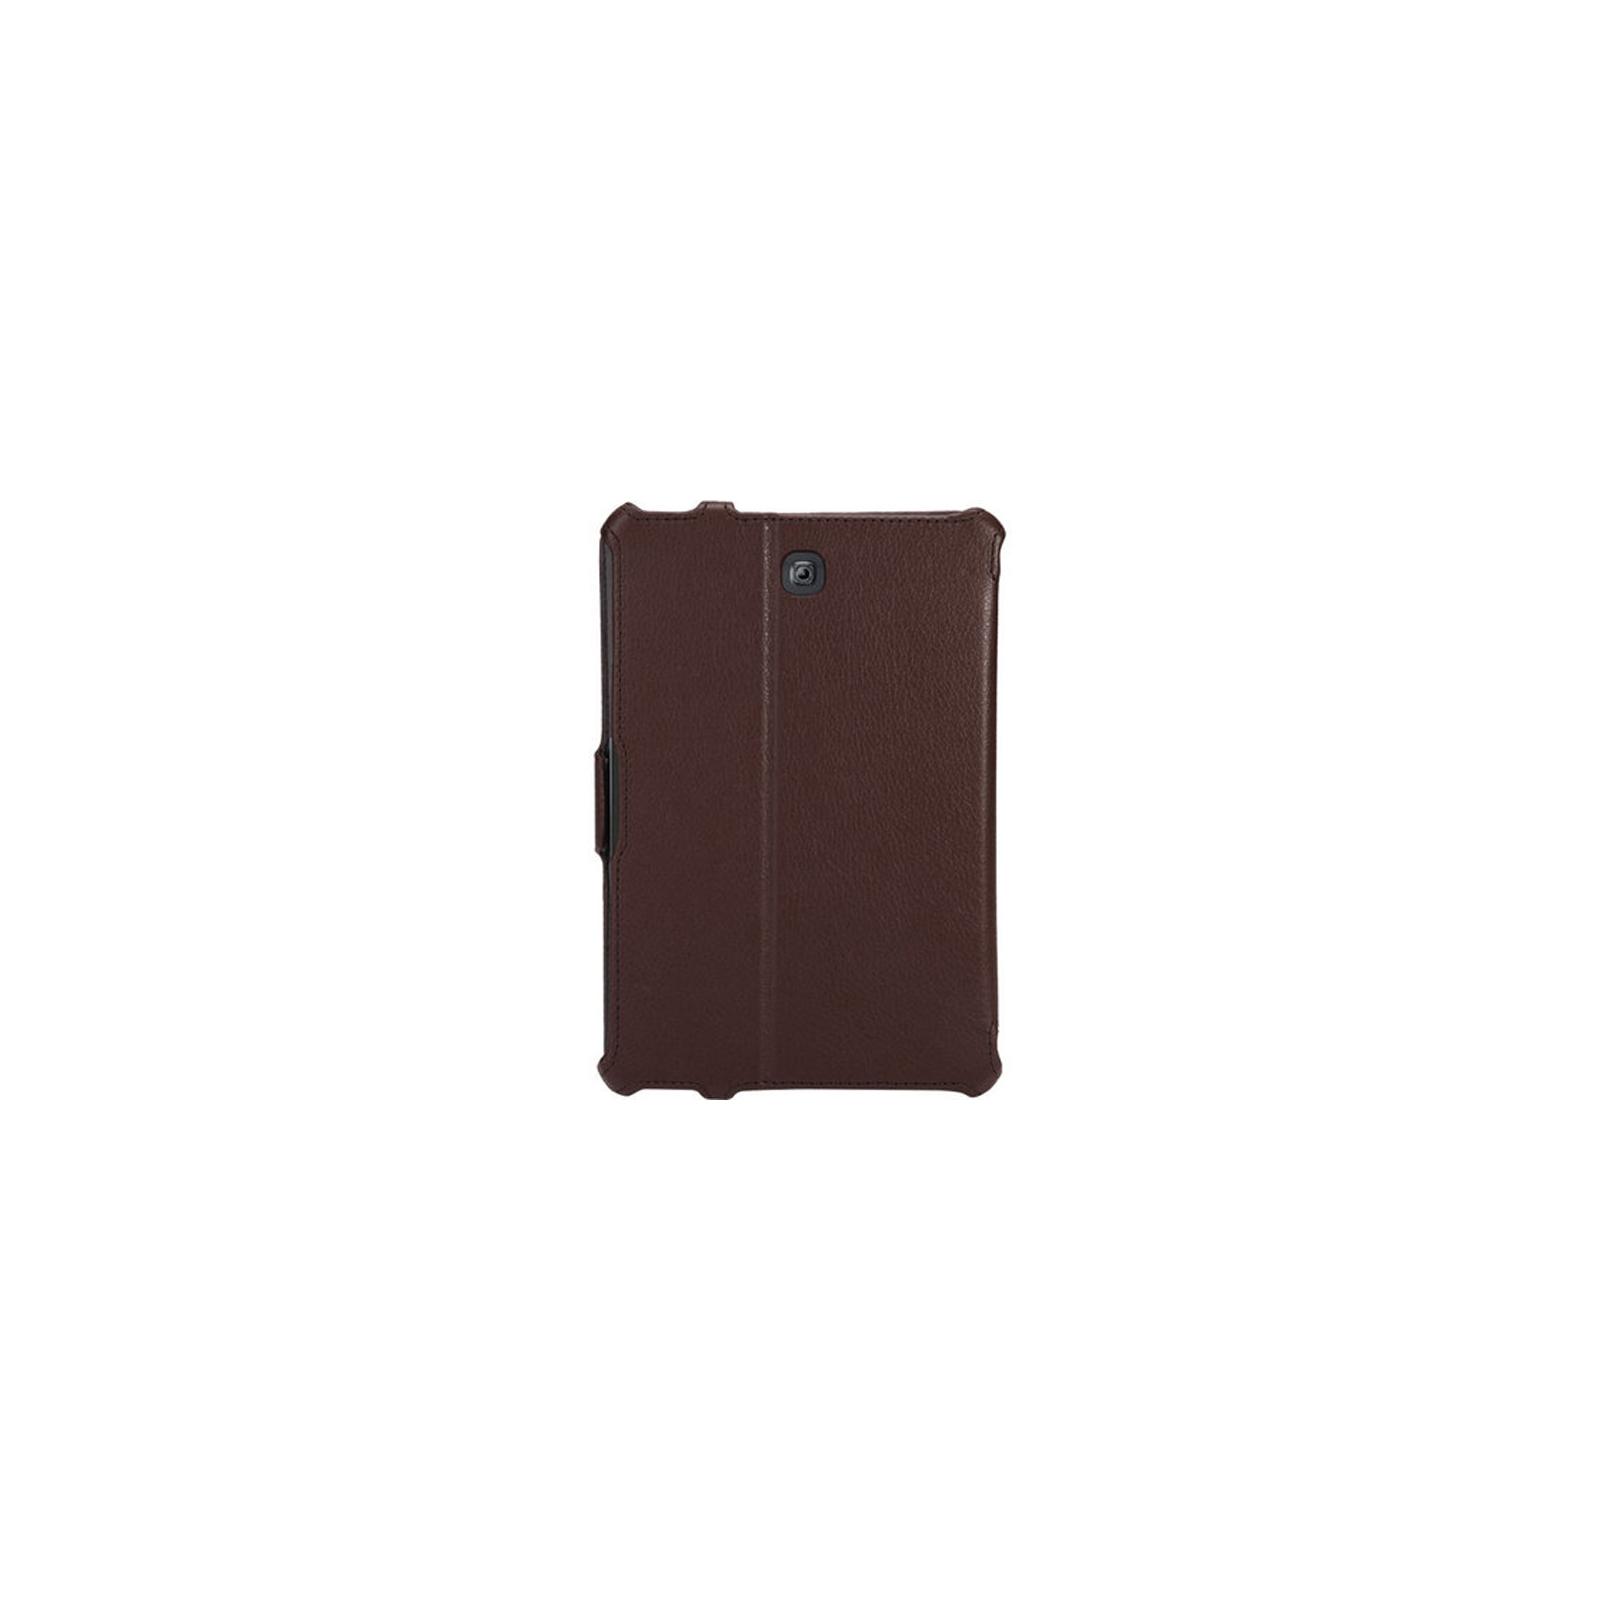 Чехол для планшета AirOn для Samsung Galaxy Tab S 2 8.0 brown (4822352778521) изображение 2